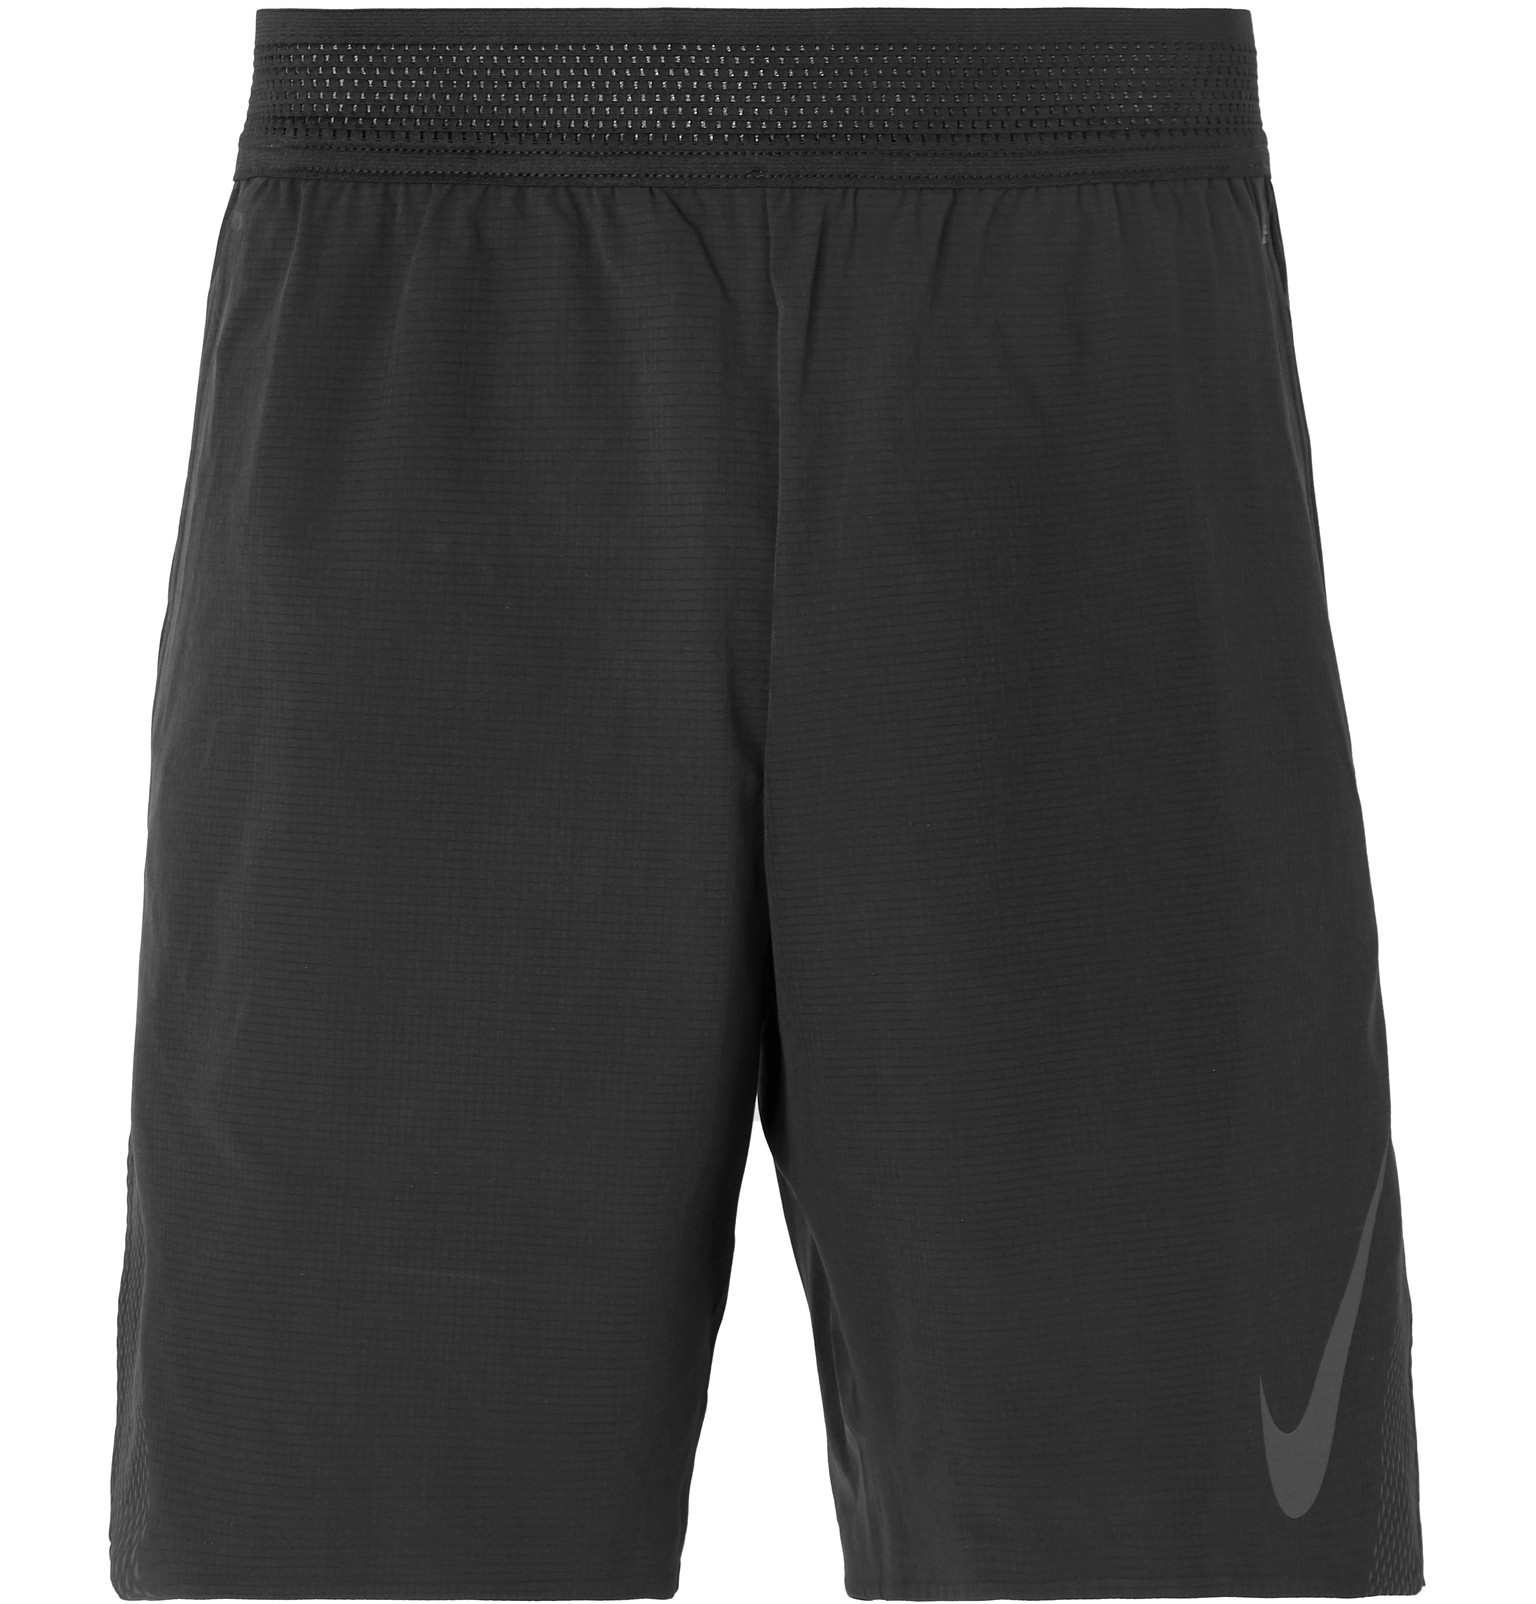 ce2c4df58a29 Nike Training - Flex Repel 3.0 Ripstop Shorts